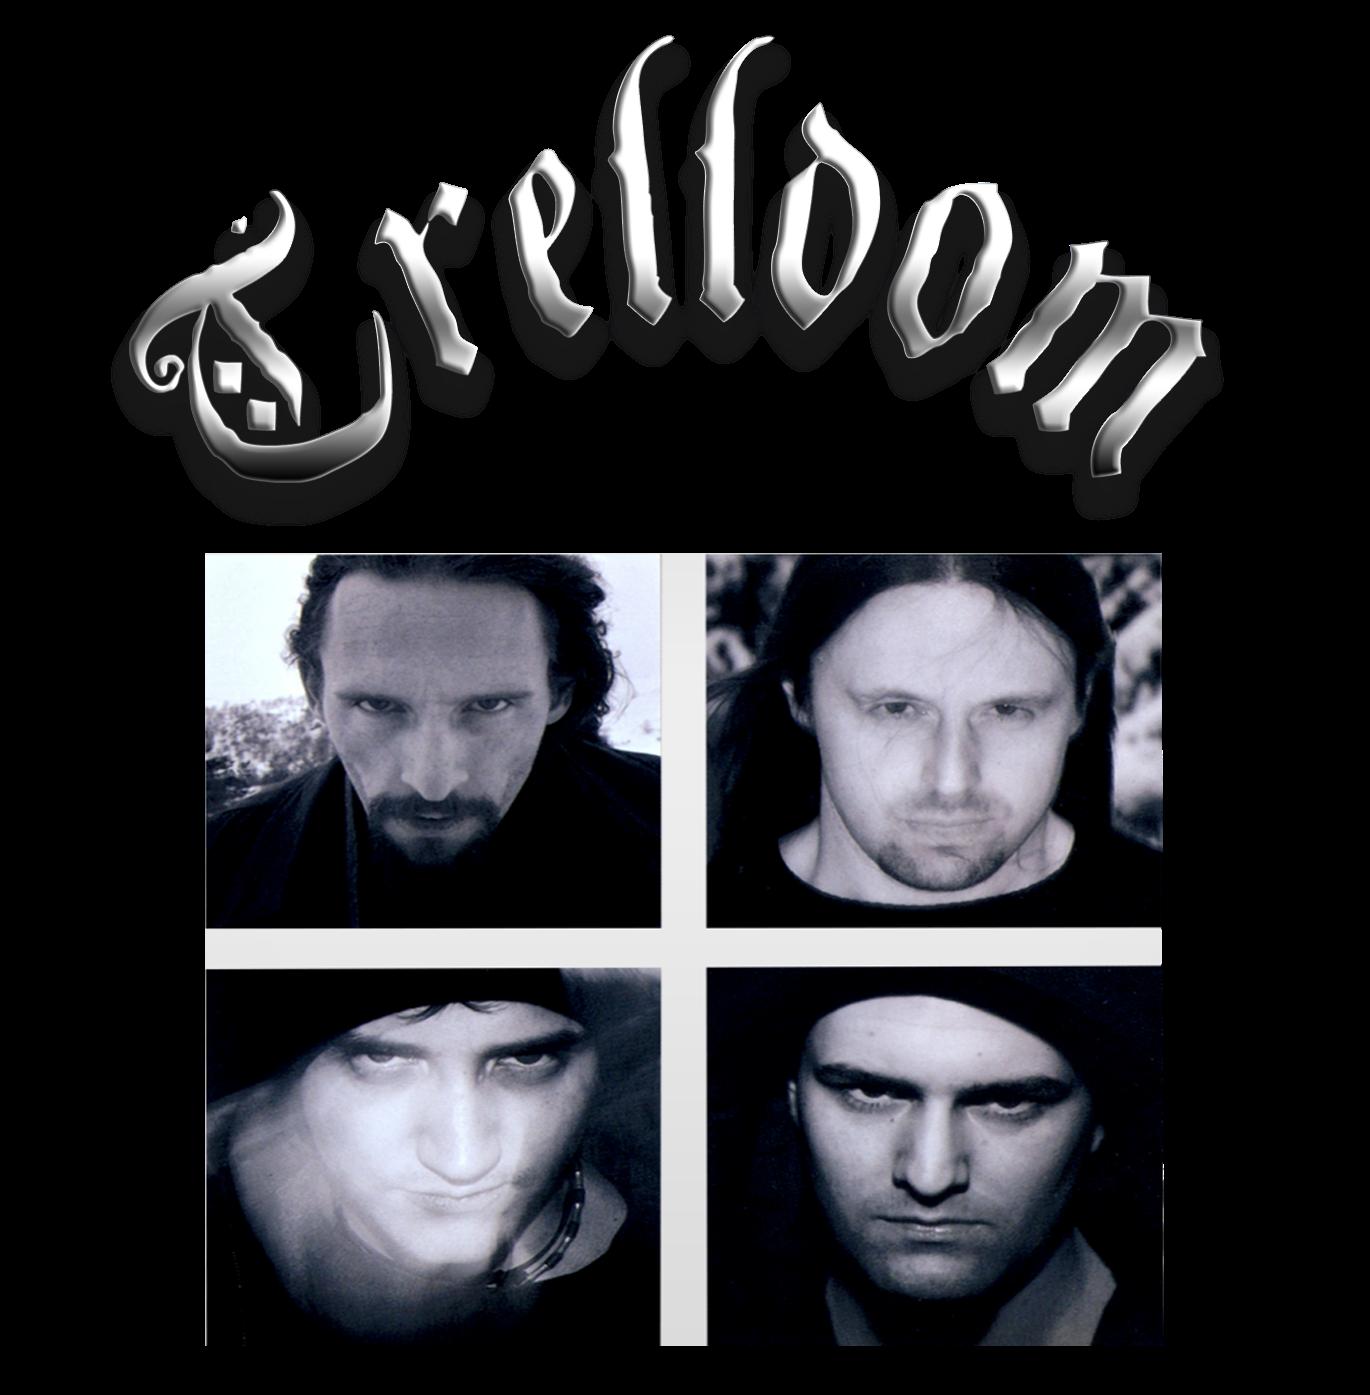 Trelldom (Gaahl ex-Gorgoroth) - Discografia [Black Metal]